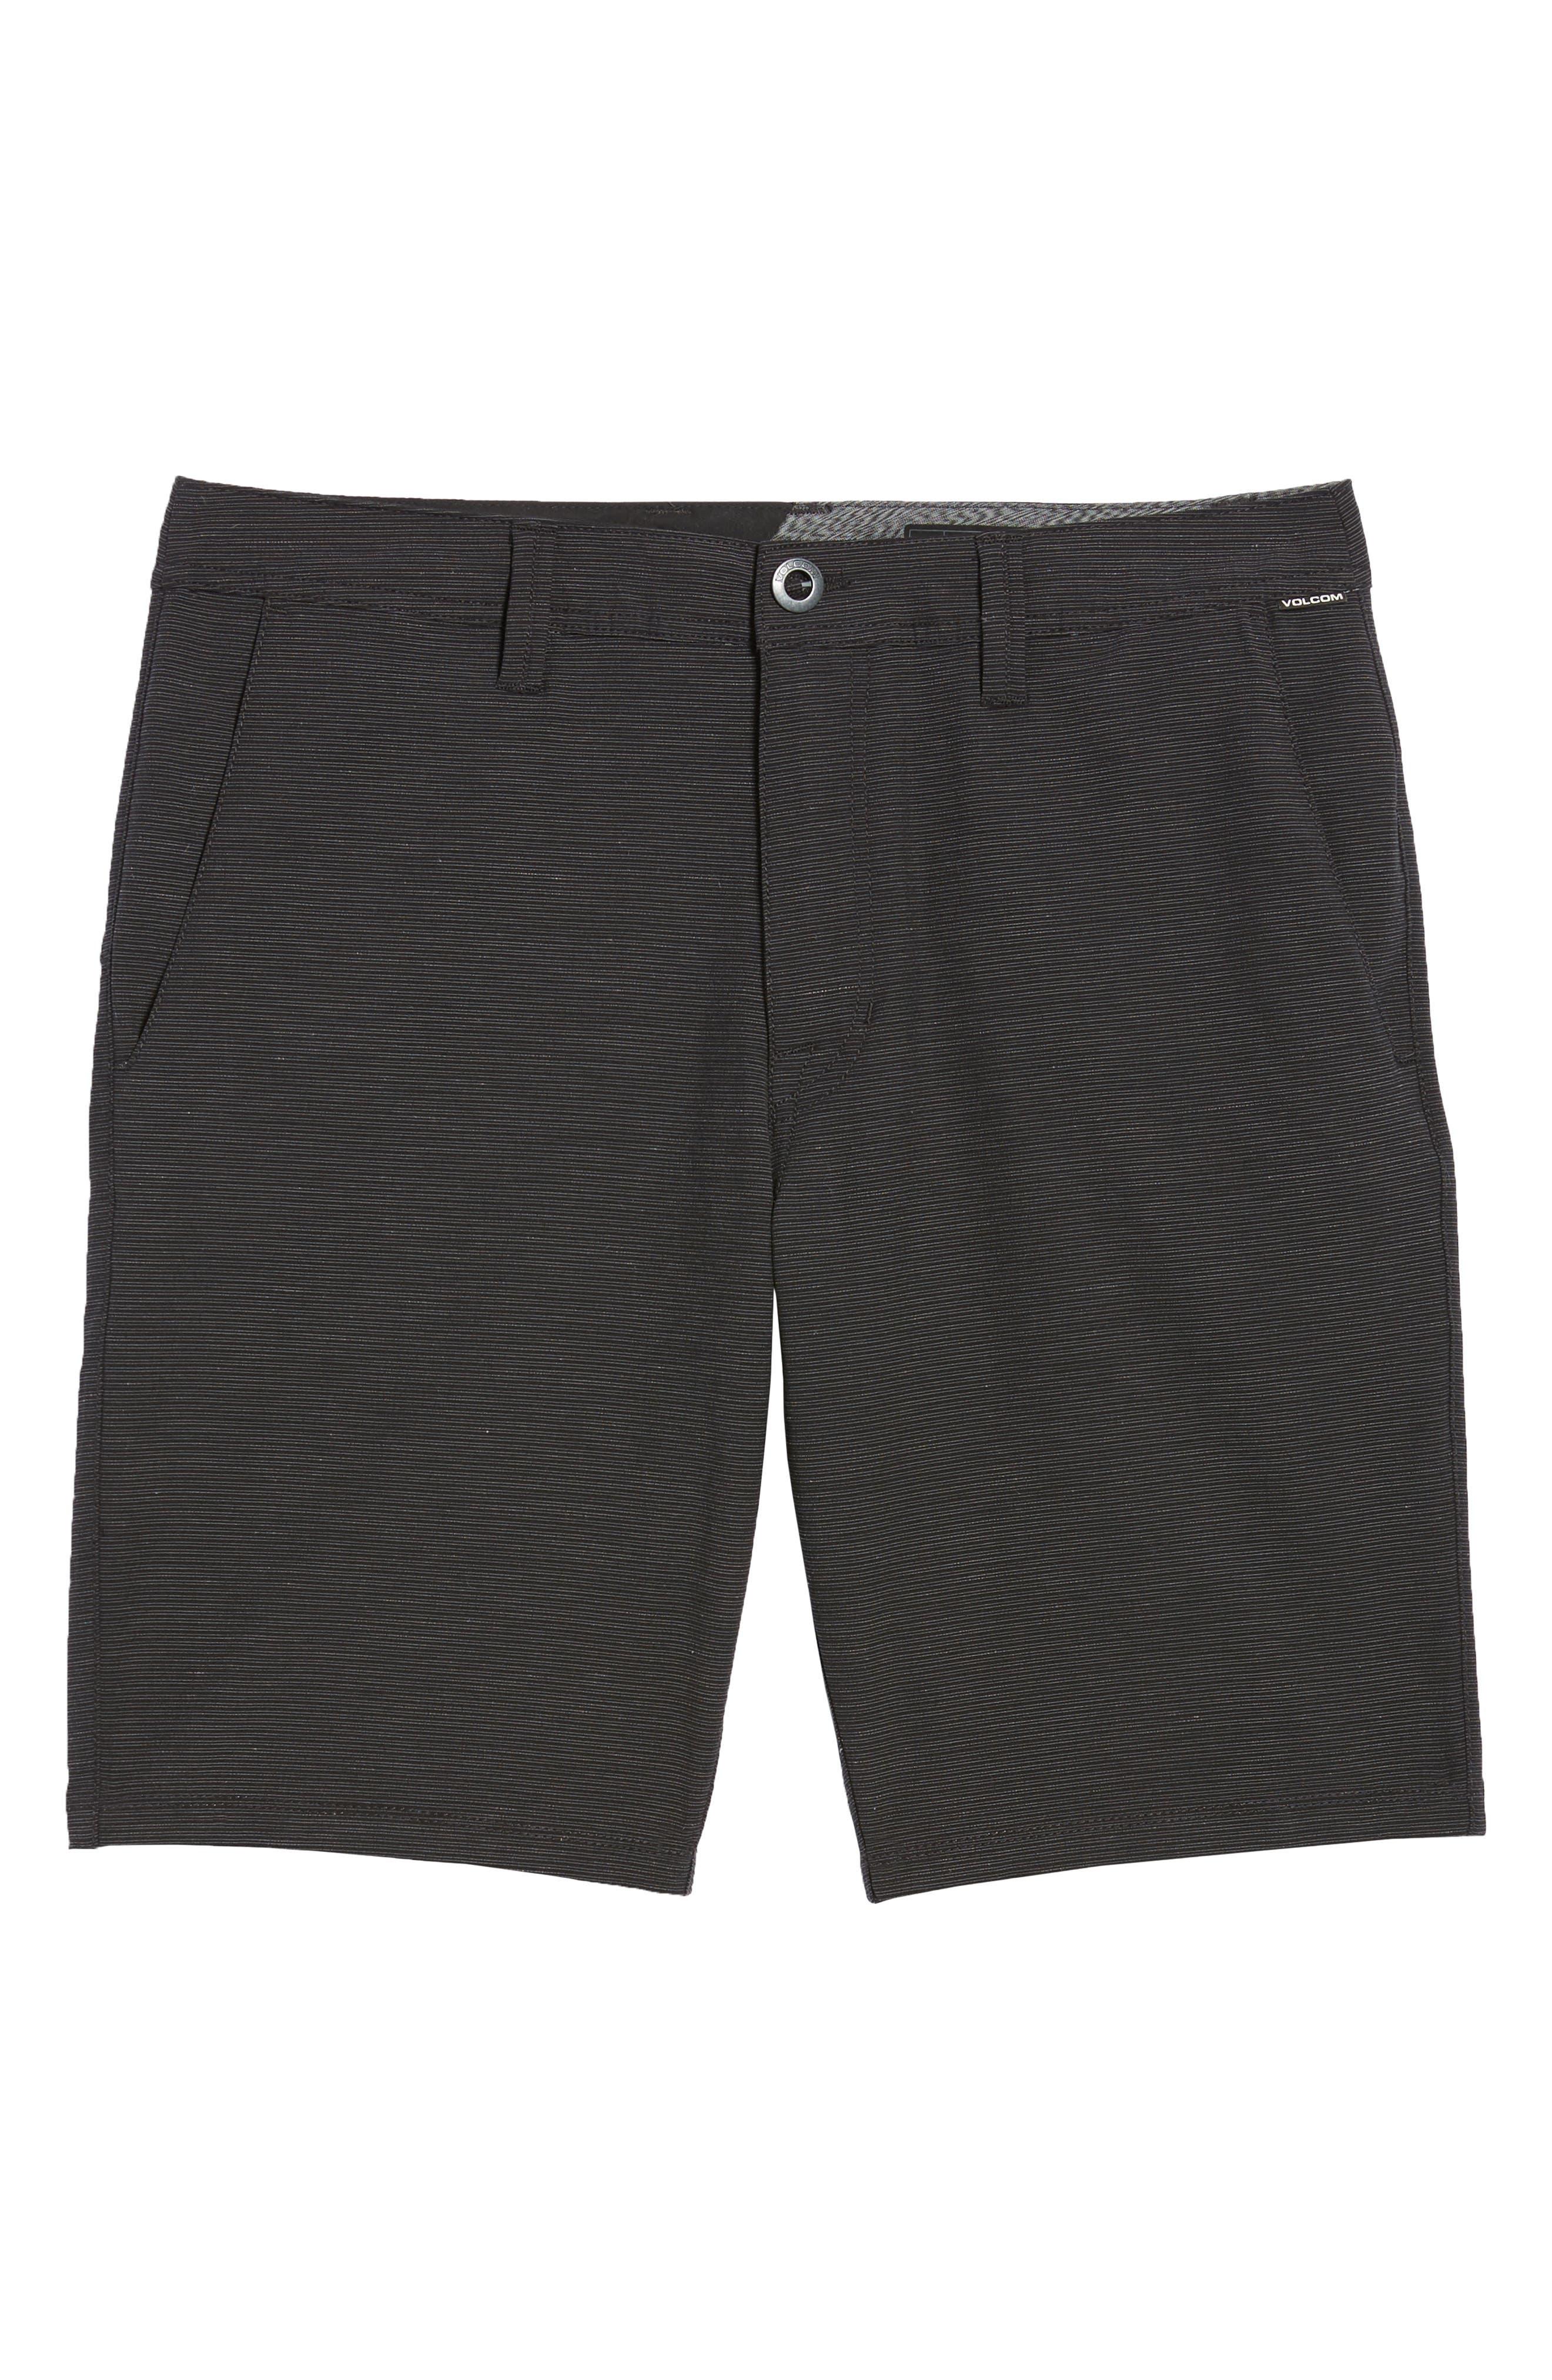 Surf N' Turf Slub Hybrid Shorts,                             Alternate thumbnail 6, color,                             Black